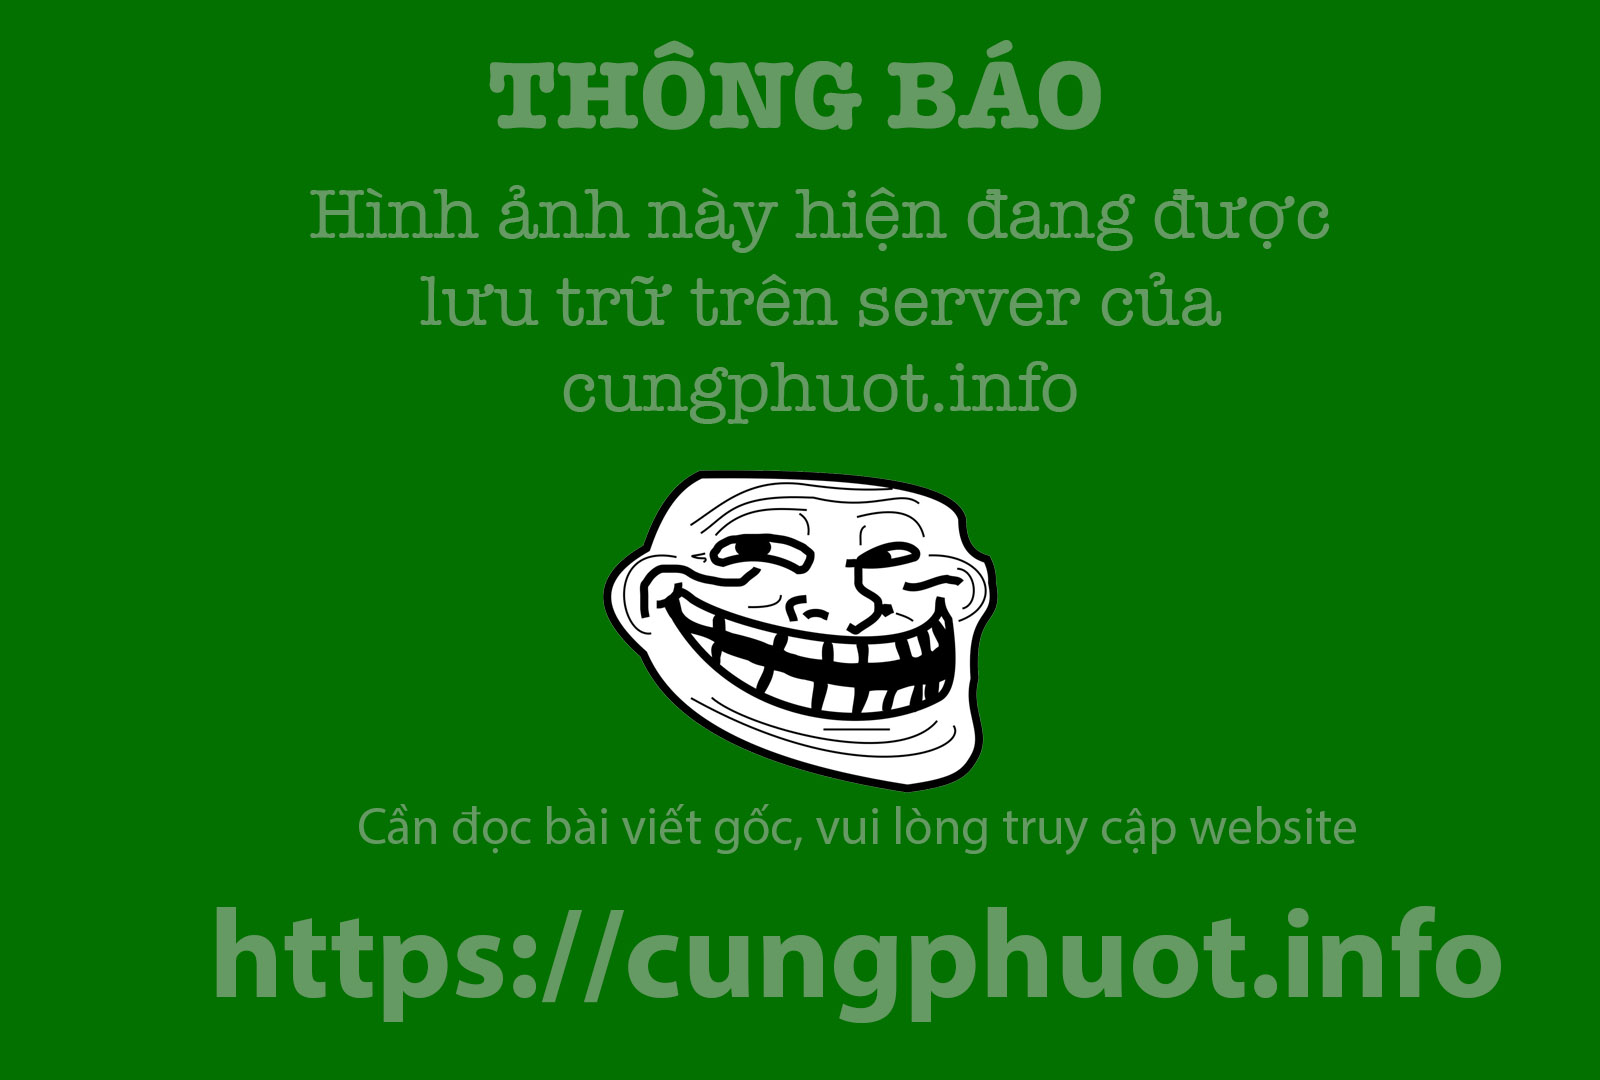 nhung-tiem-ca-phe-dep-phai-di-mot-lan-cho-biet-o-da-nang-ivivu-1